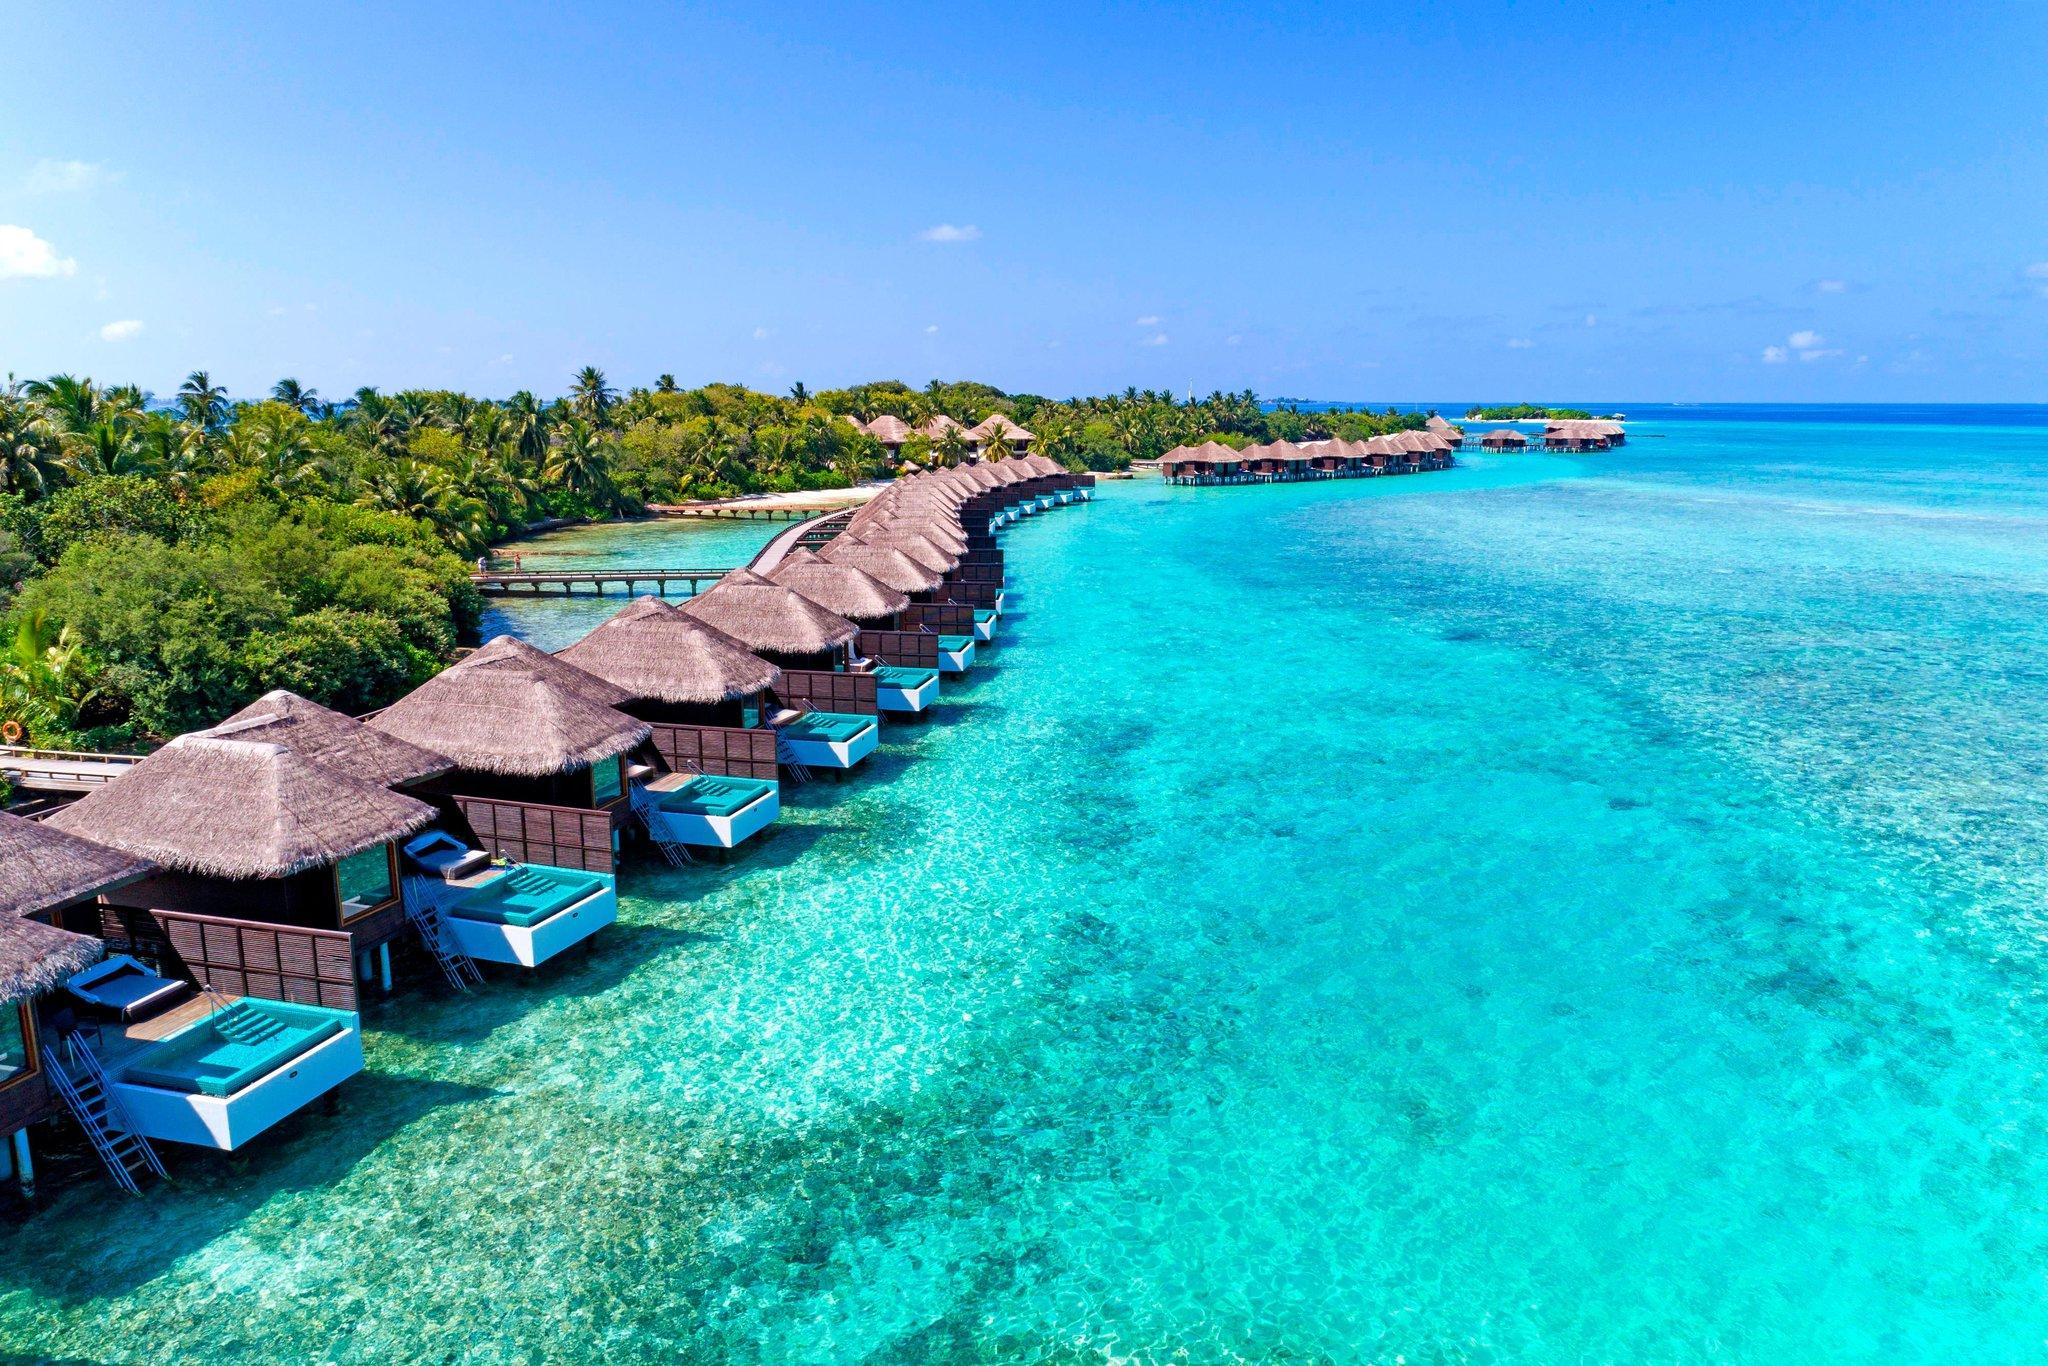 Sheraton Maldives Full Moon Resort and Spa